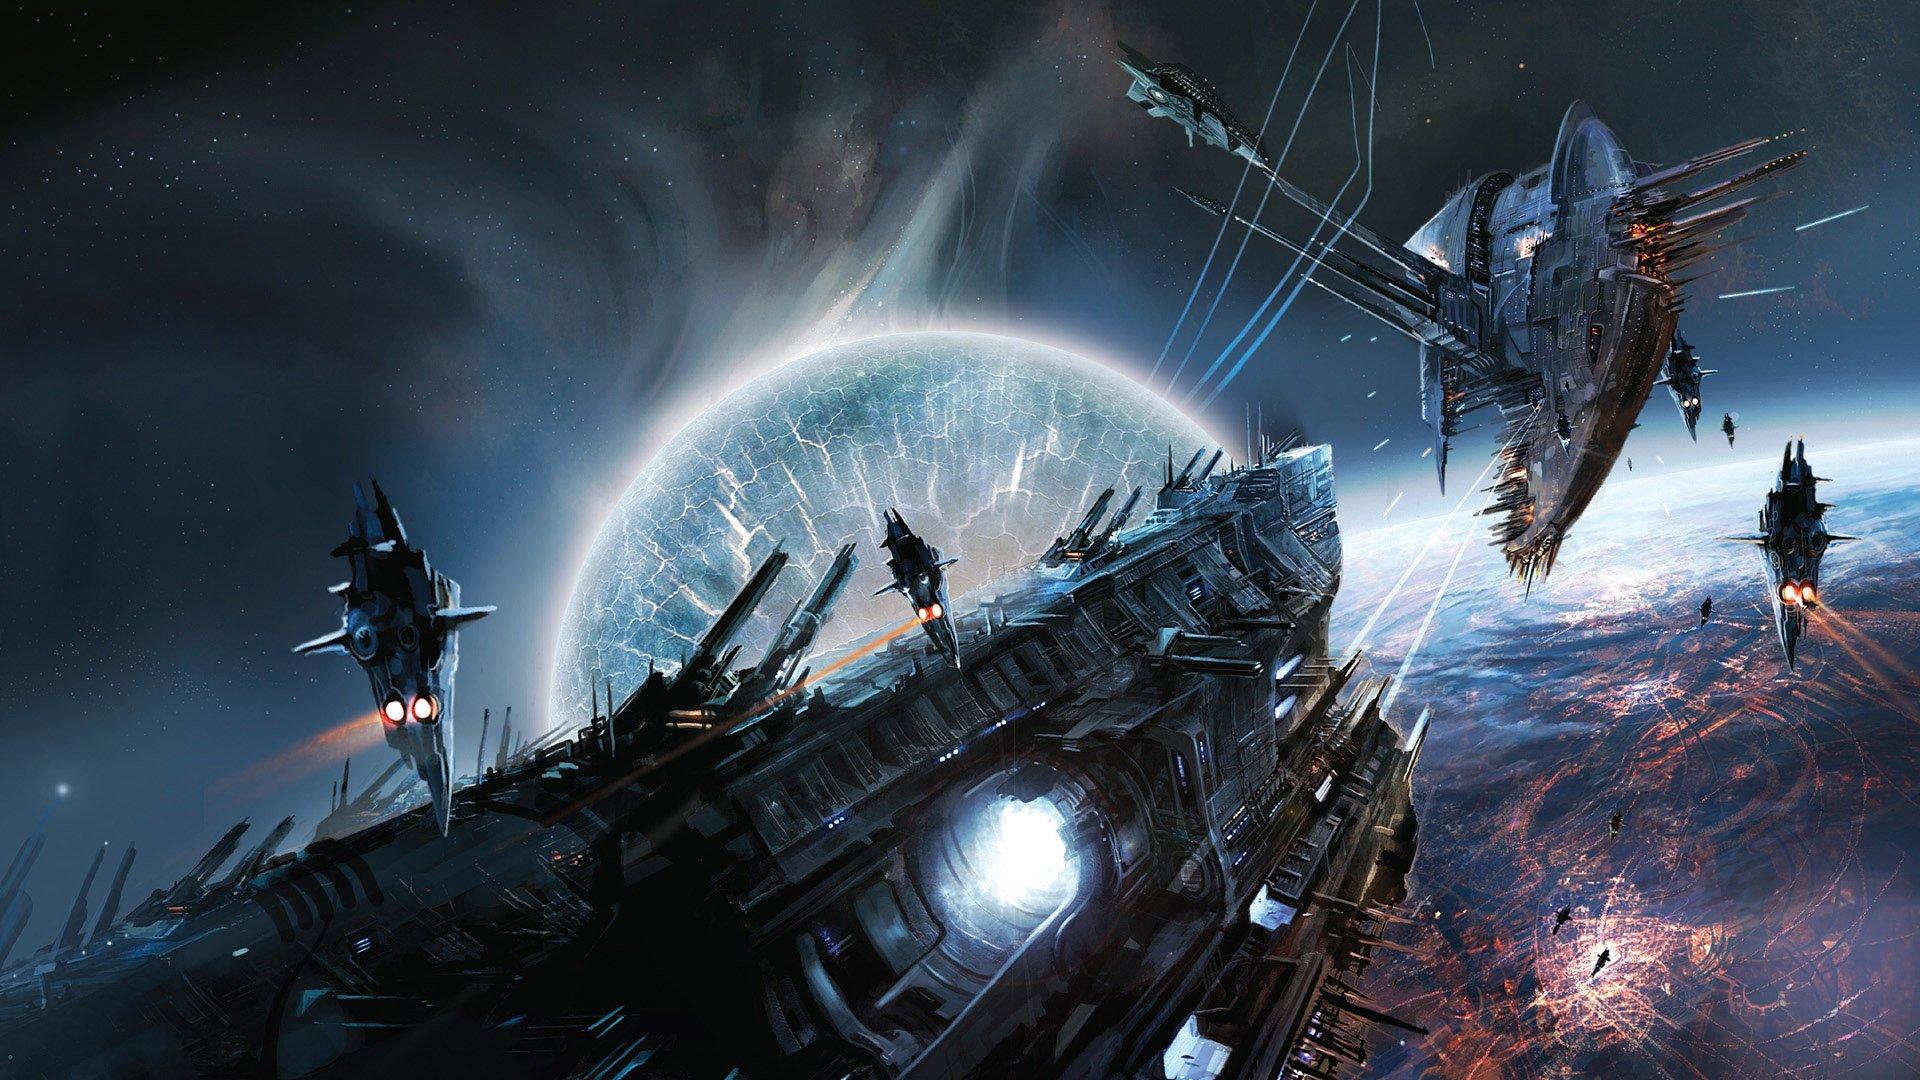 Space War Game Scene Wallpapers | HD Wallpapers